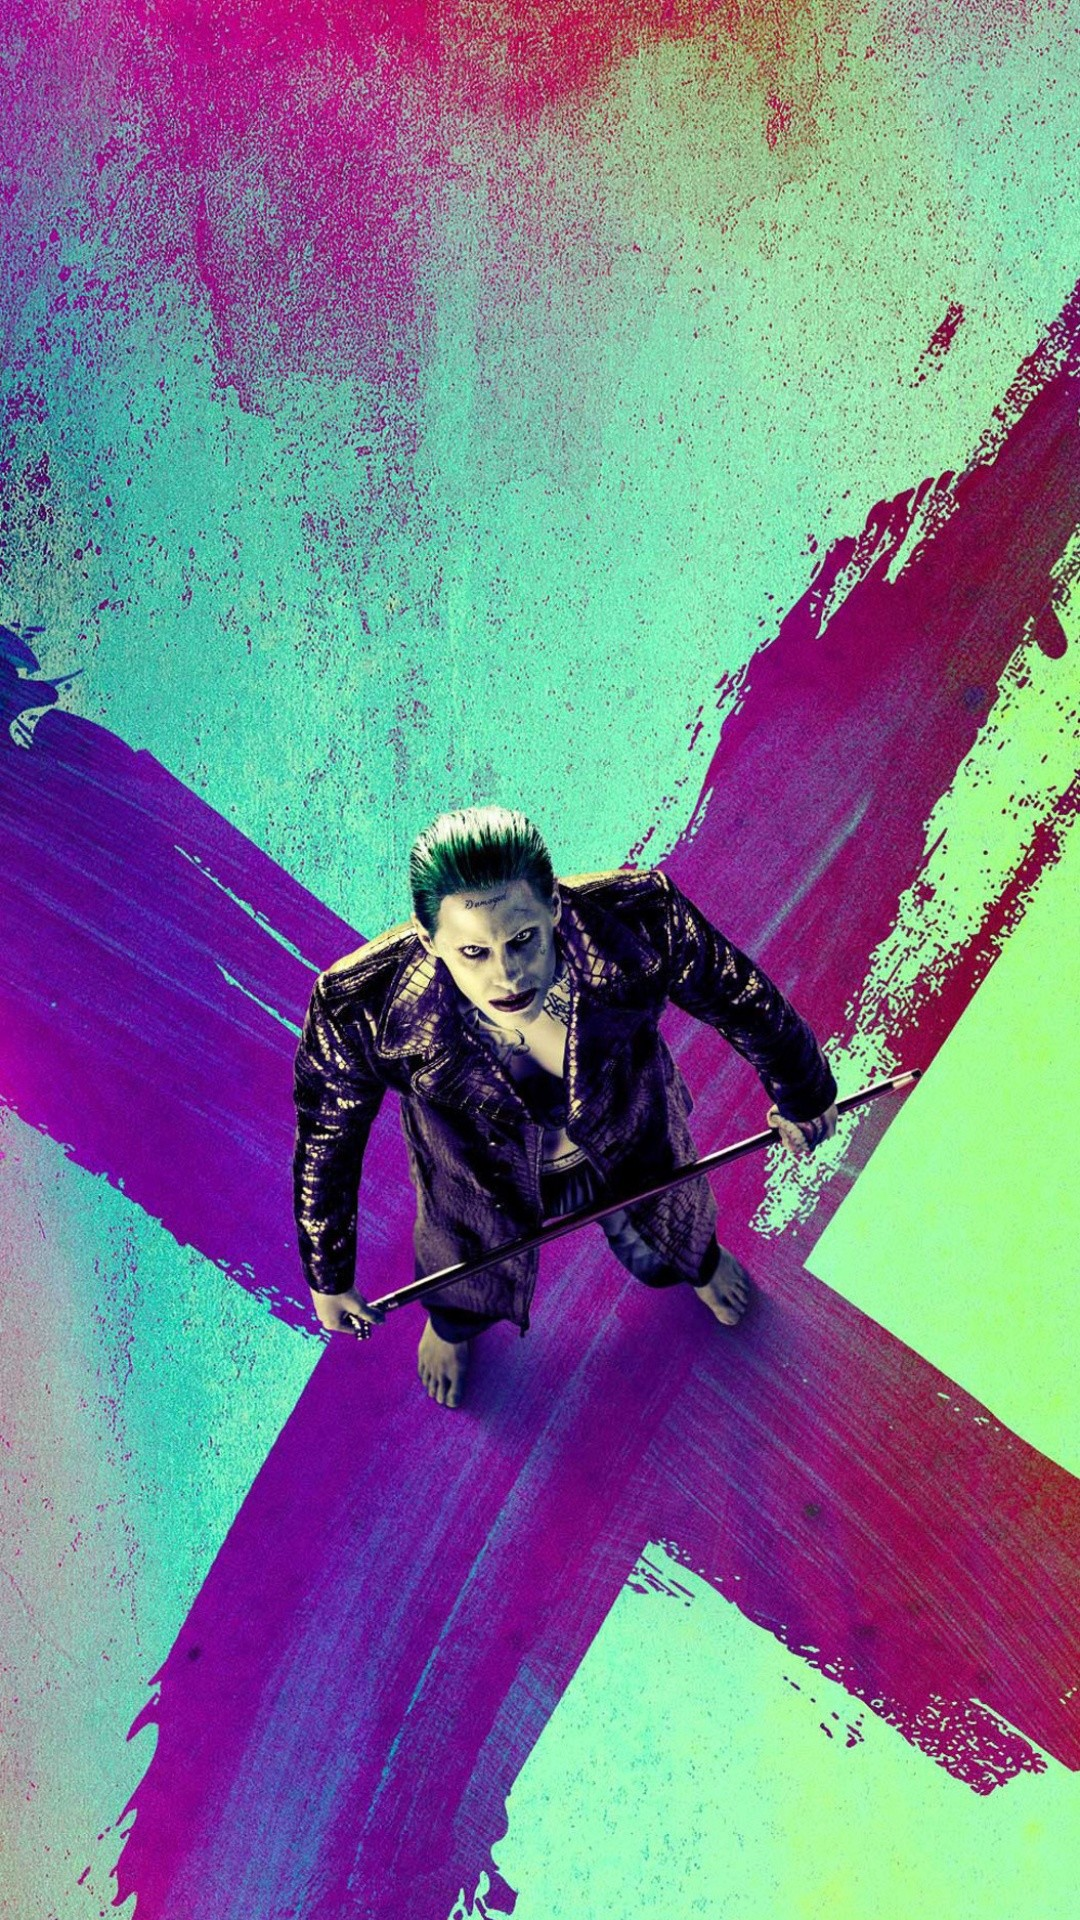 Suicide Squad Joker X iPhone 6+ HD Wallpaper …